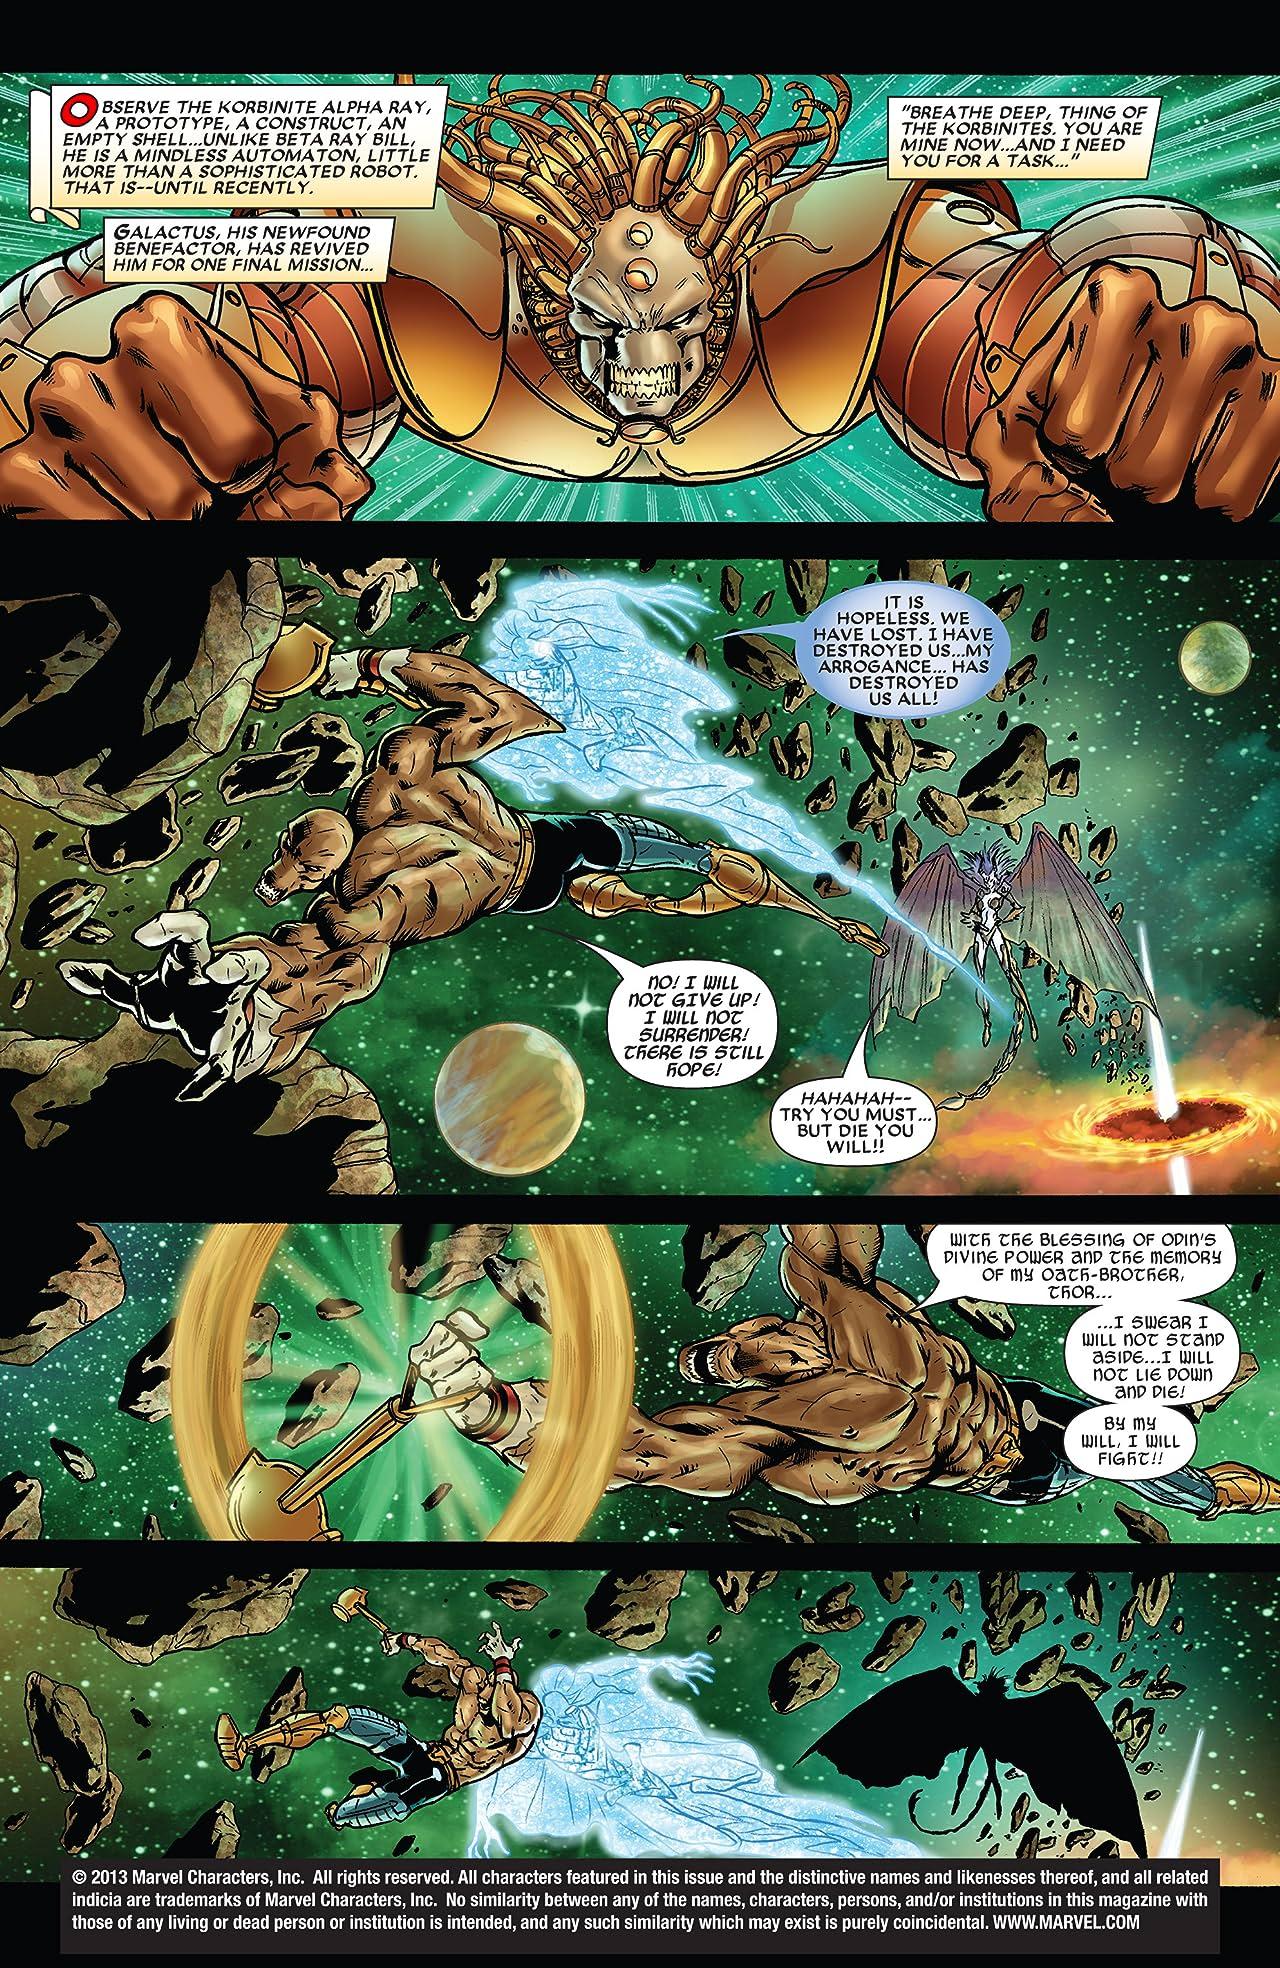 Stormbreaker: The Saga Of Beta Ray Bill #5 (of 6)